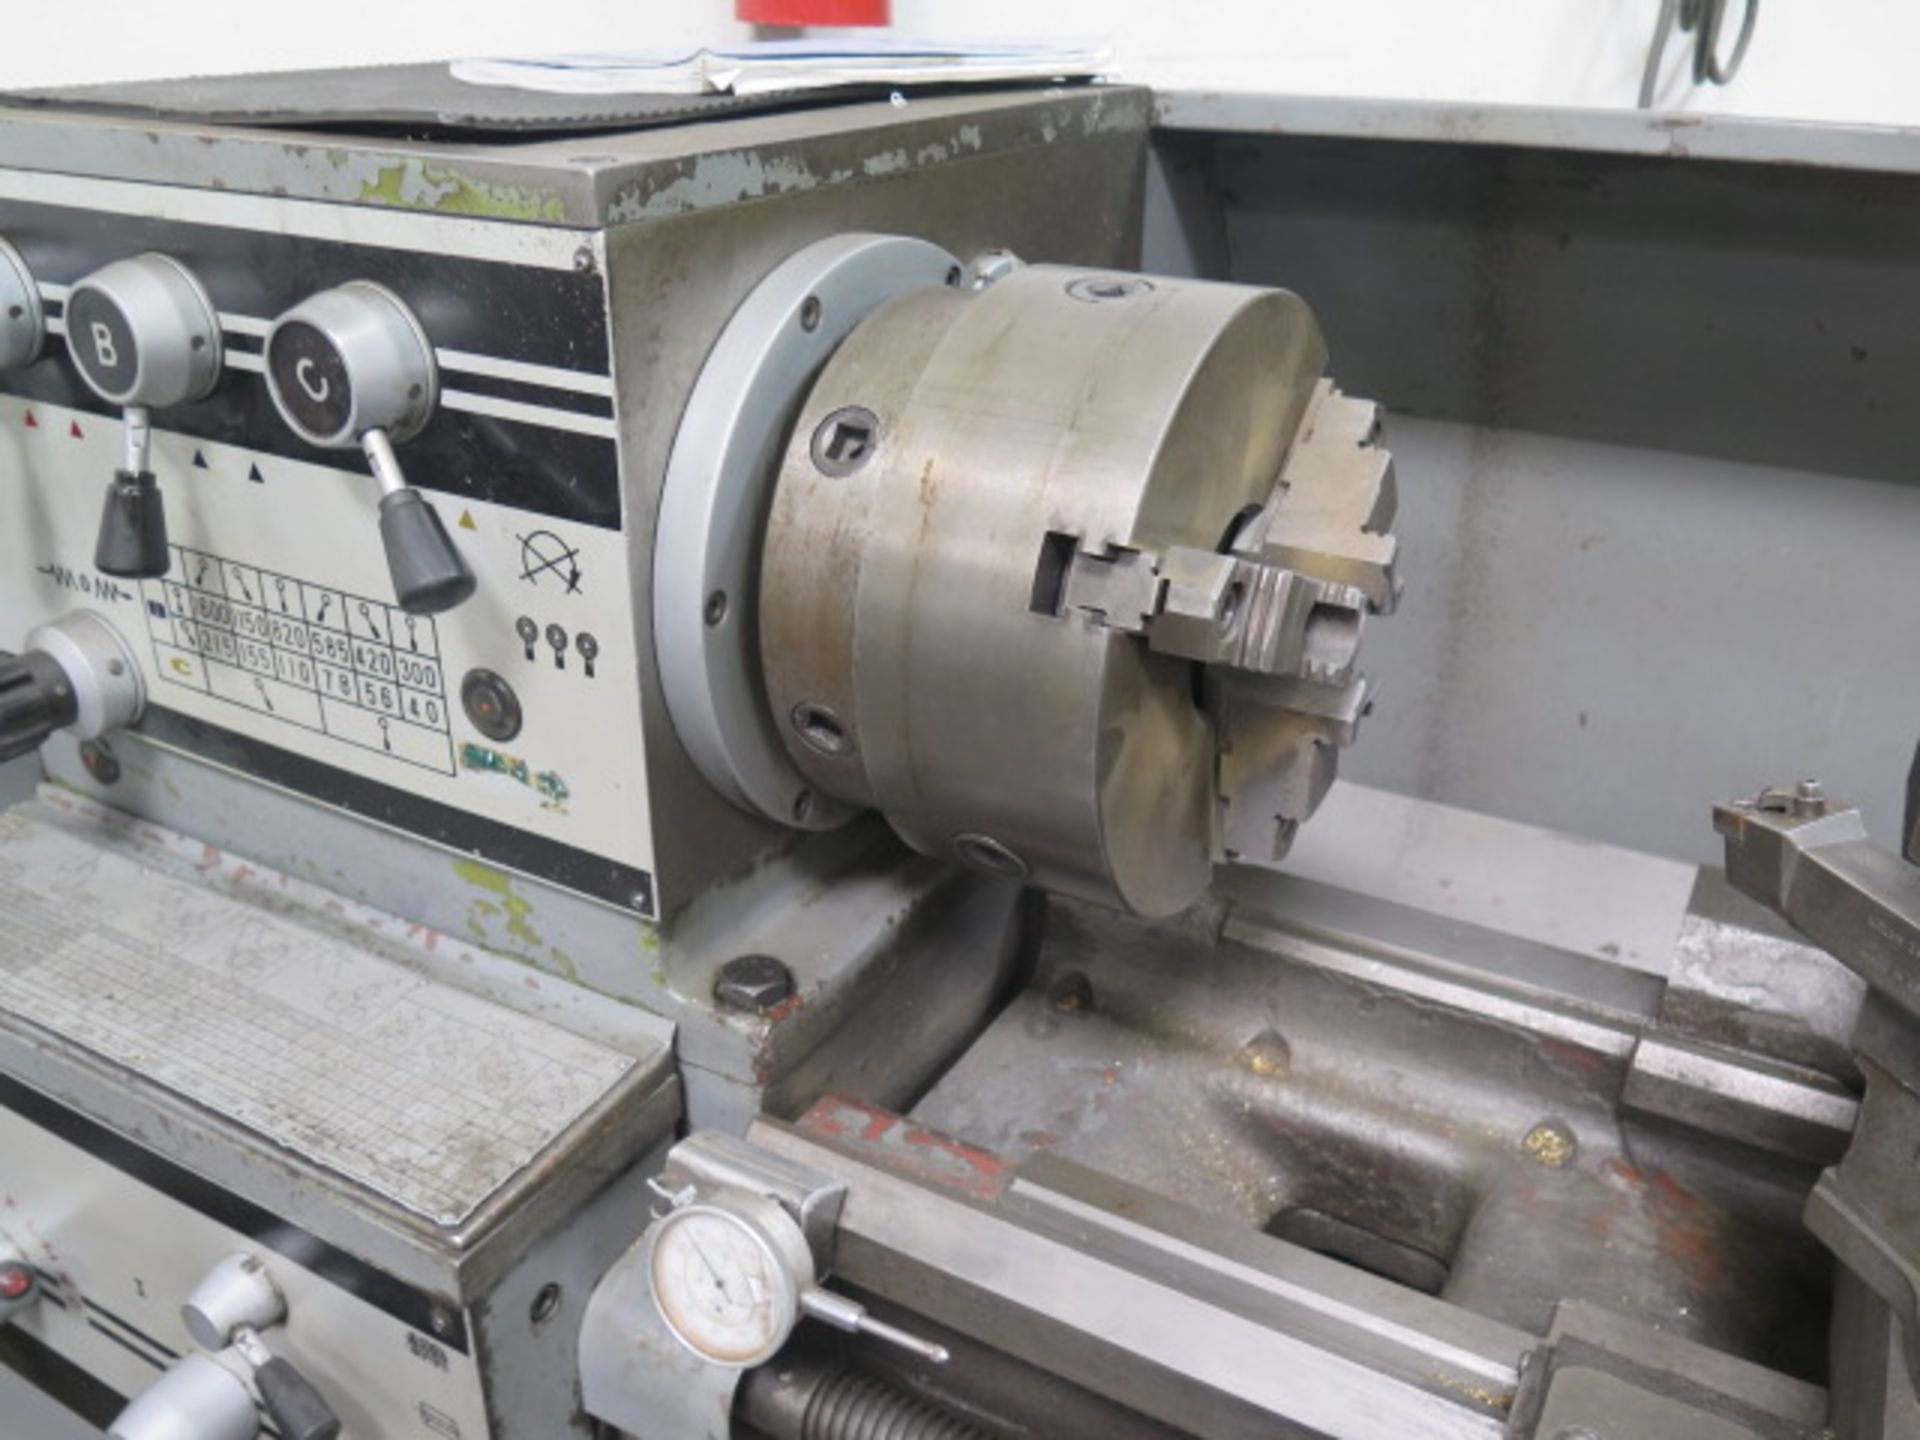 "Lotto 16 - Kinwa / Jet 1660 16"" x 60"" Geared Head Gap Bed Lathe s/n JW119 w/ 40-1600 RPM, 3"" Thru Spindle Bore,"